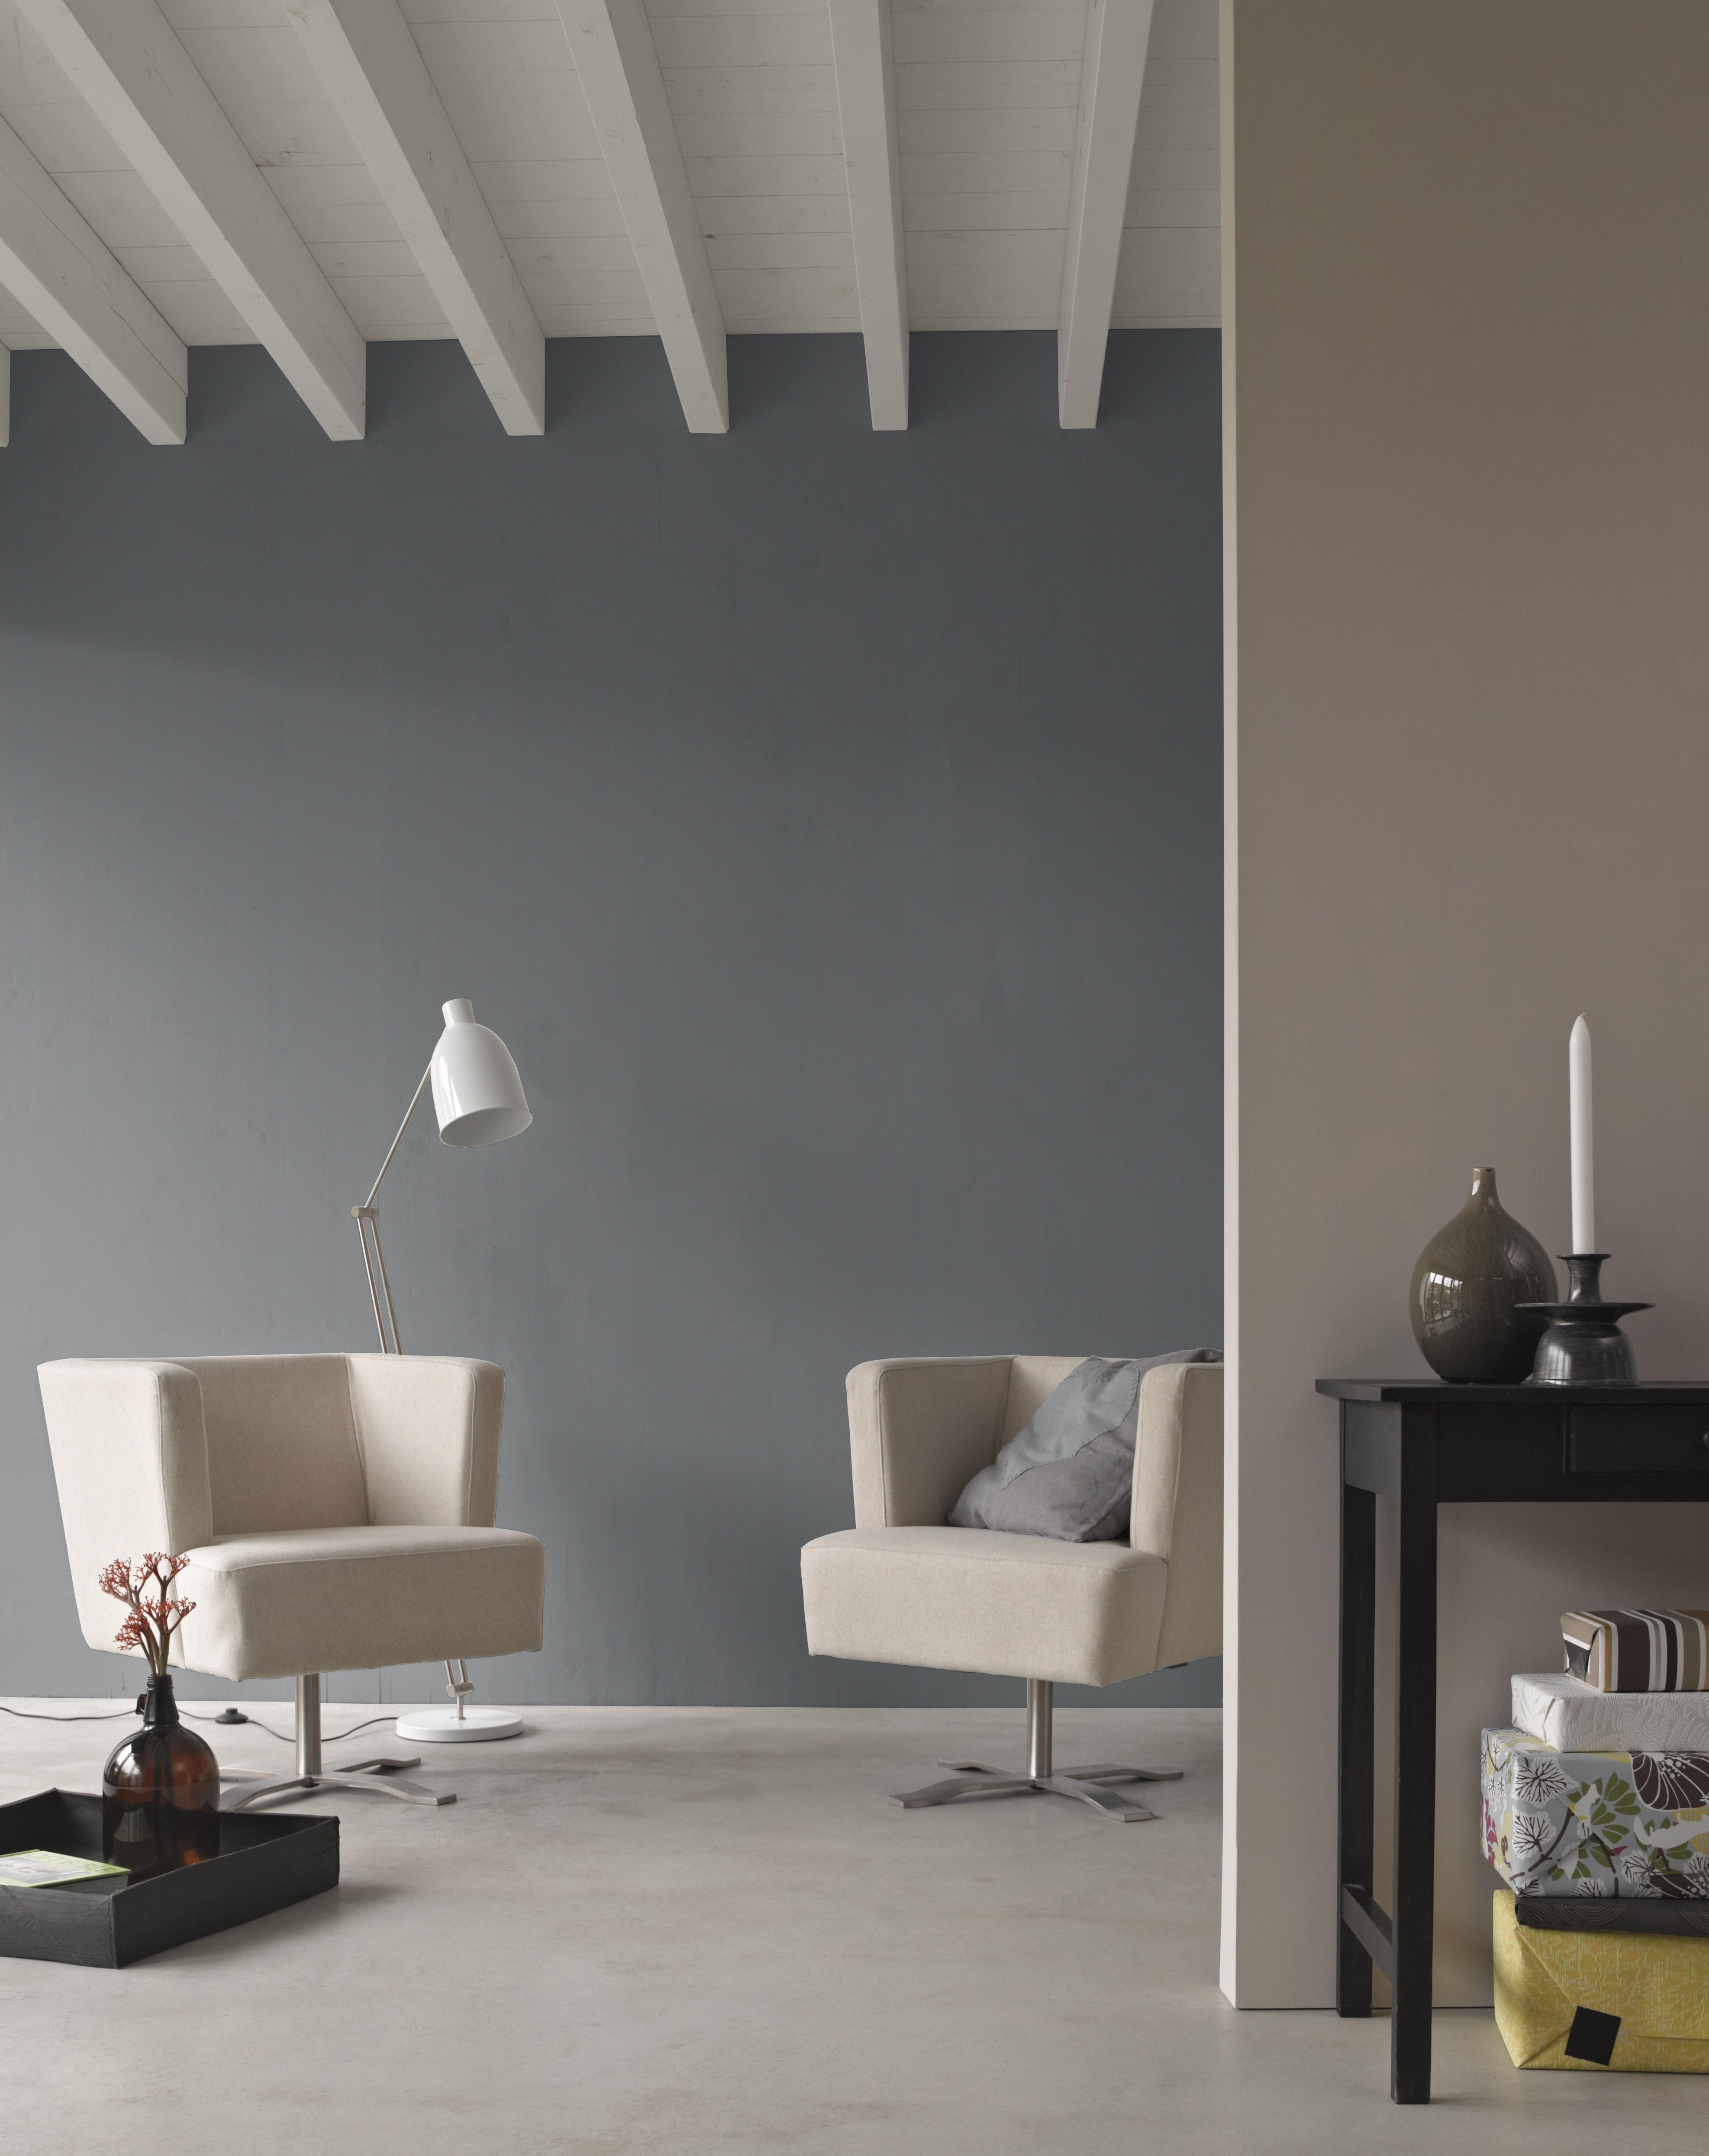 81032 - Smooth wall -